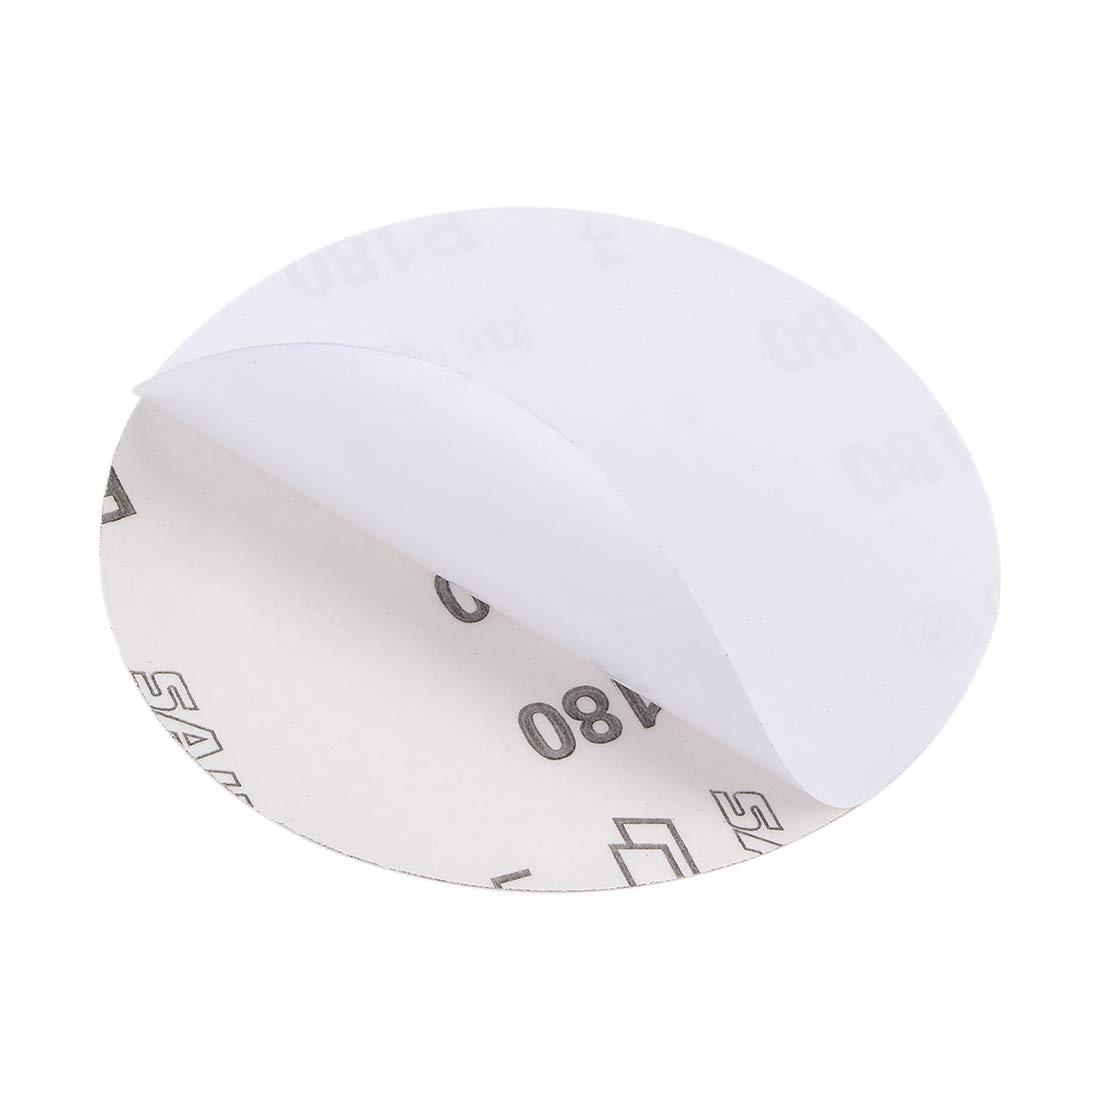 uxcell 5-Inch PSA Sanding Disc Aluminum Oxide Adhesive Back Sandpaper 60 Grit 15 Pcs